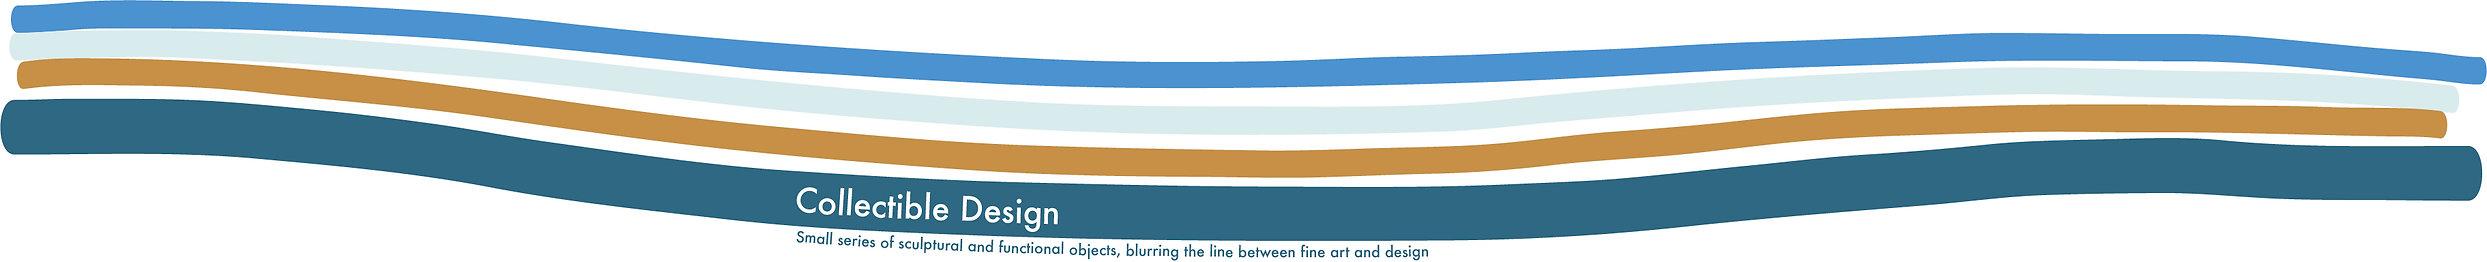 Graphisme lignes-Collectible design.jpg